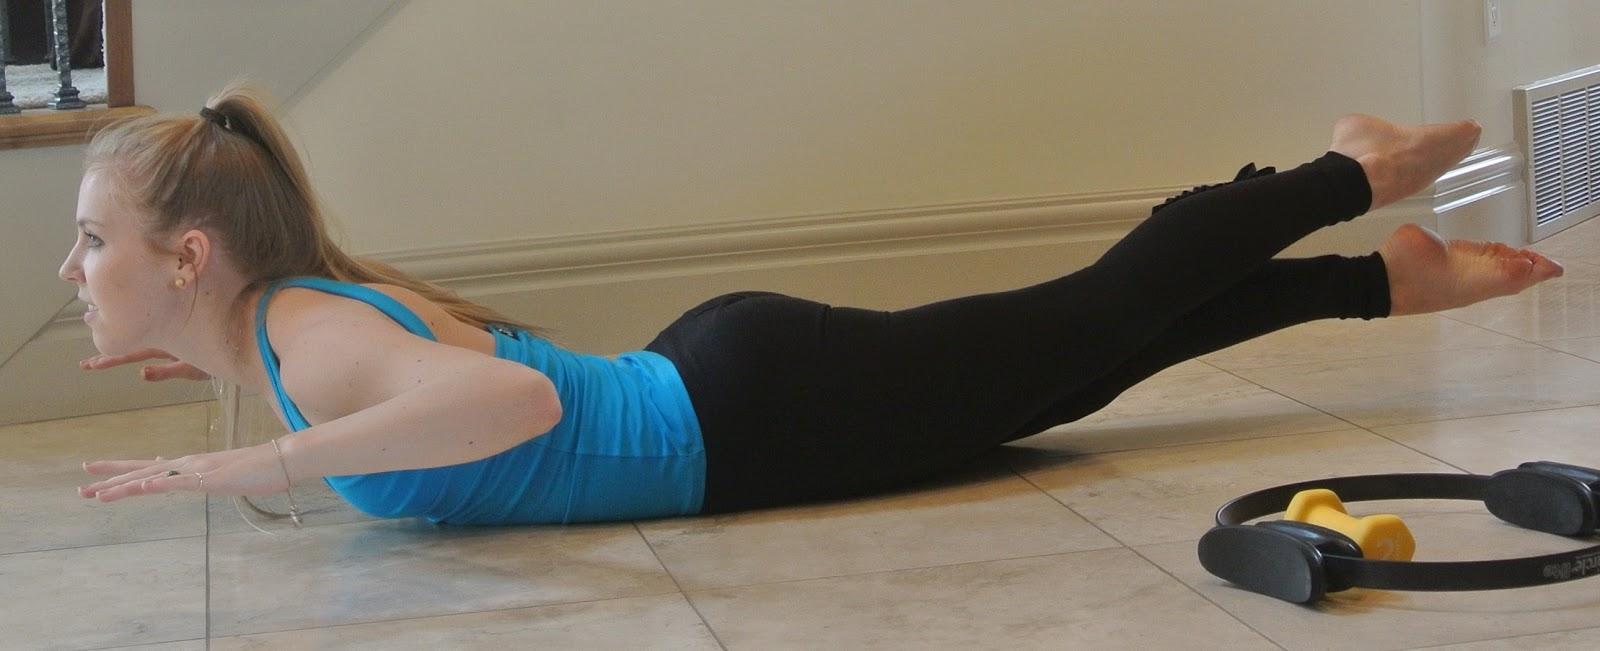 Bree Lena Pilates Workout